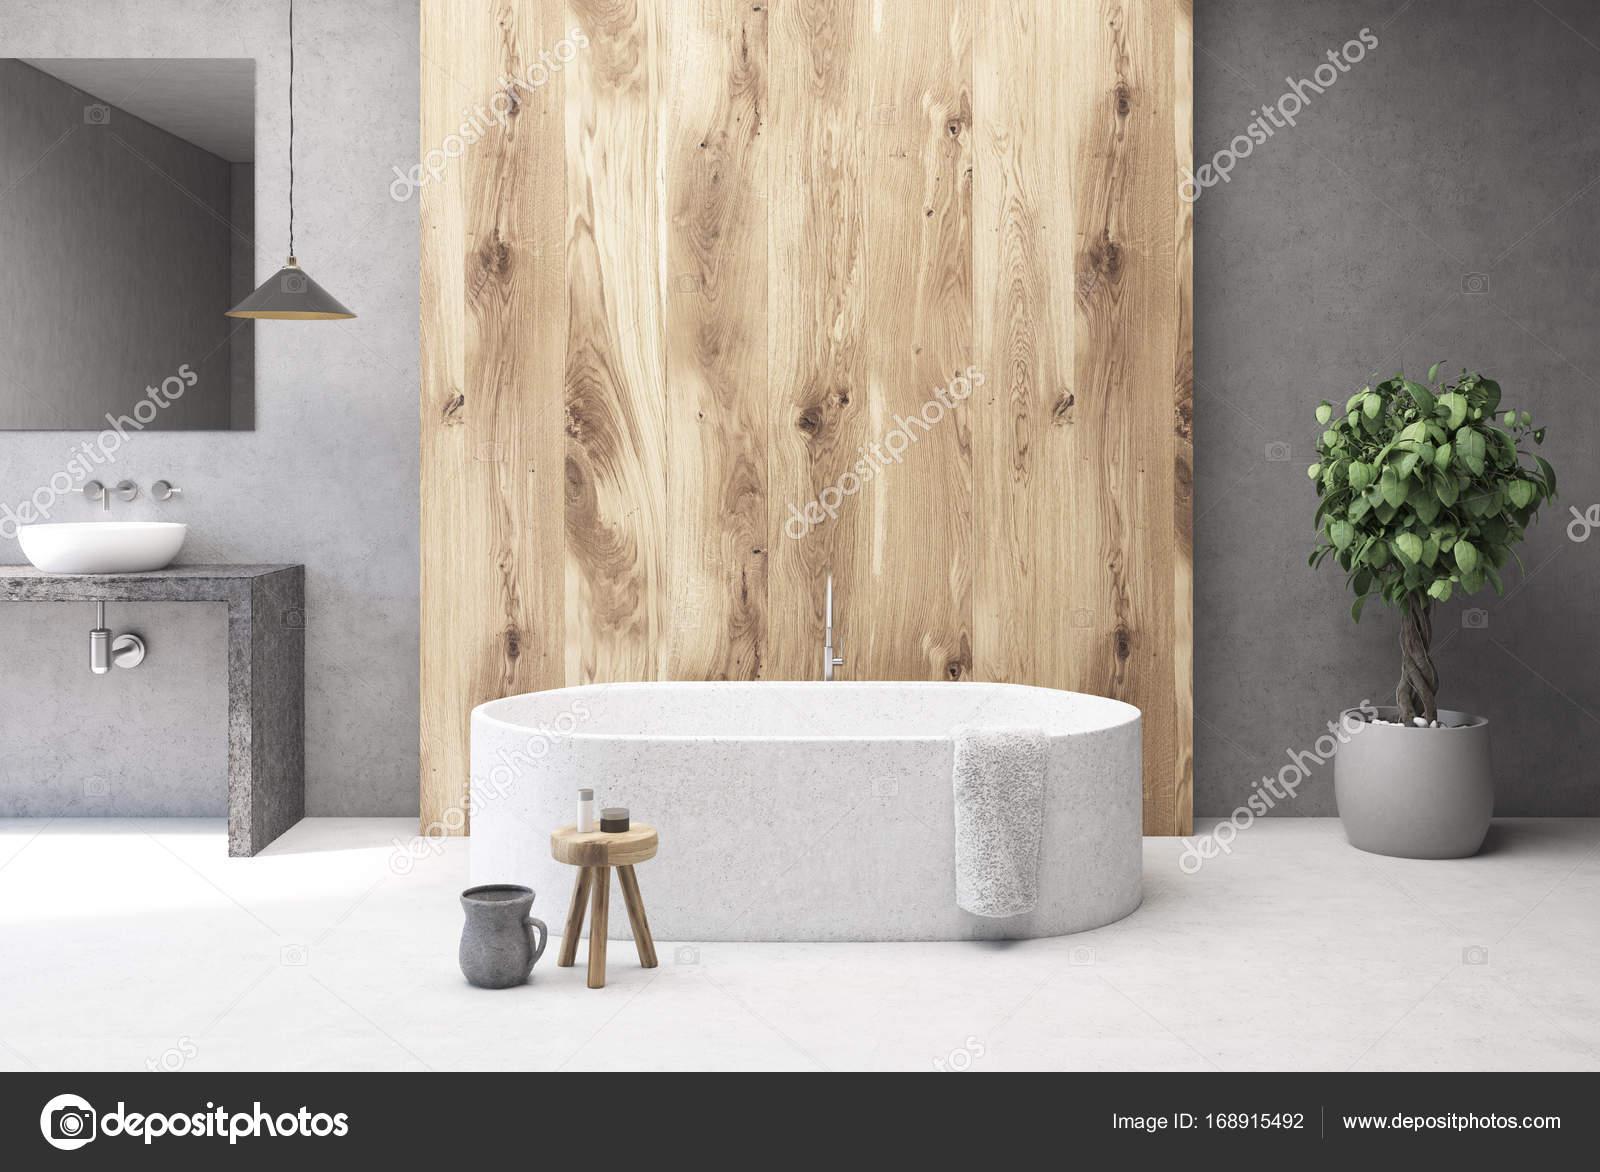 Badkamer Beton Interieur : Betonnen en houten badkamer interieur bad u stockfoto